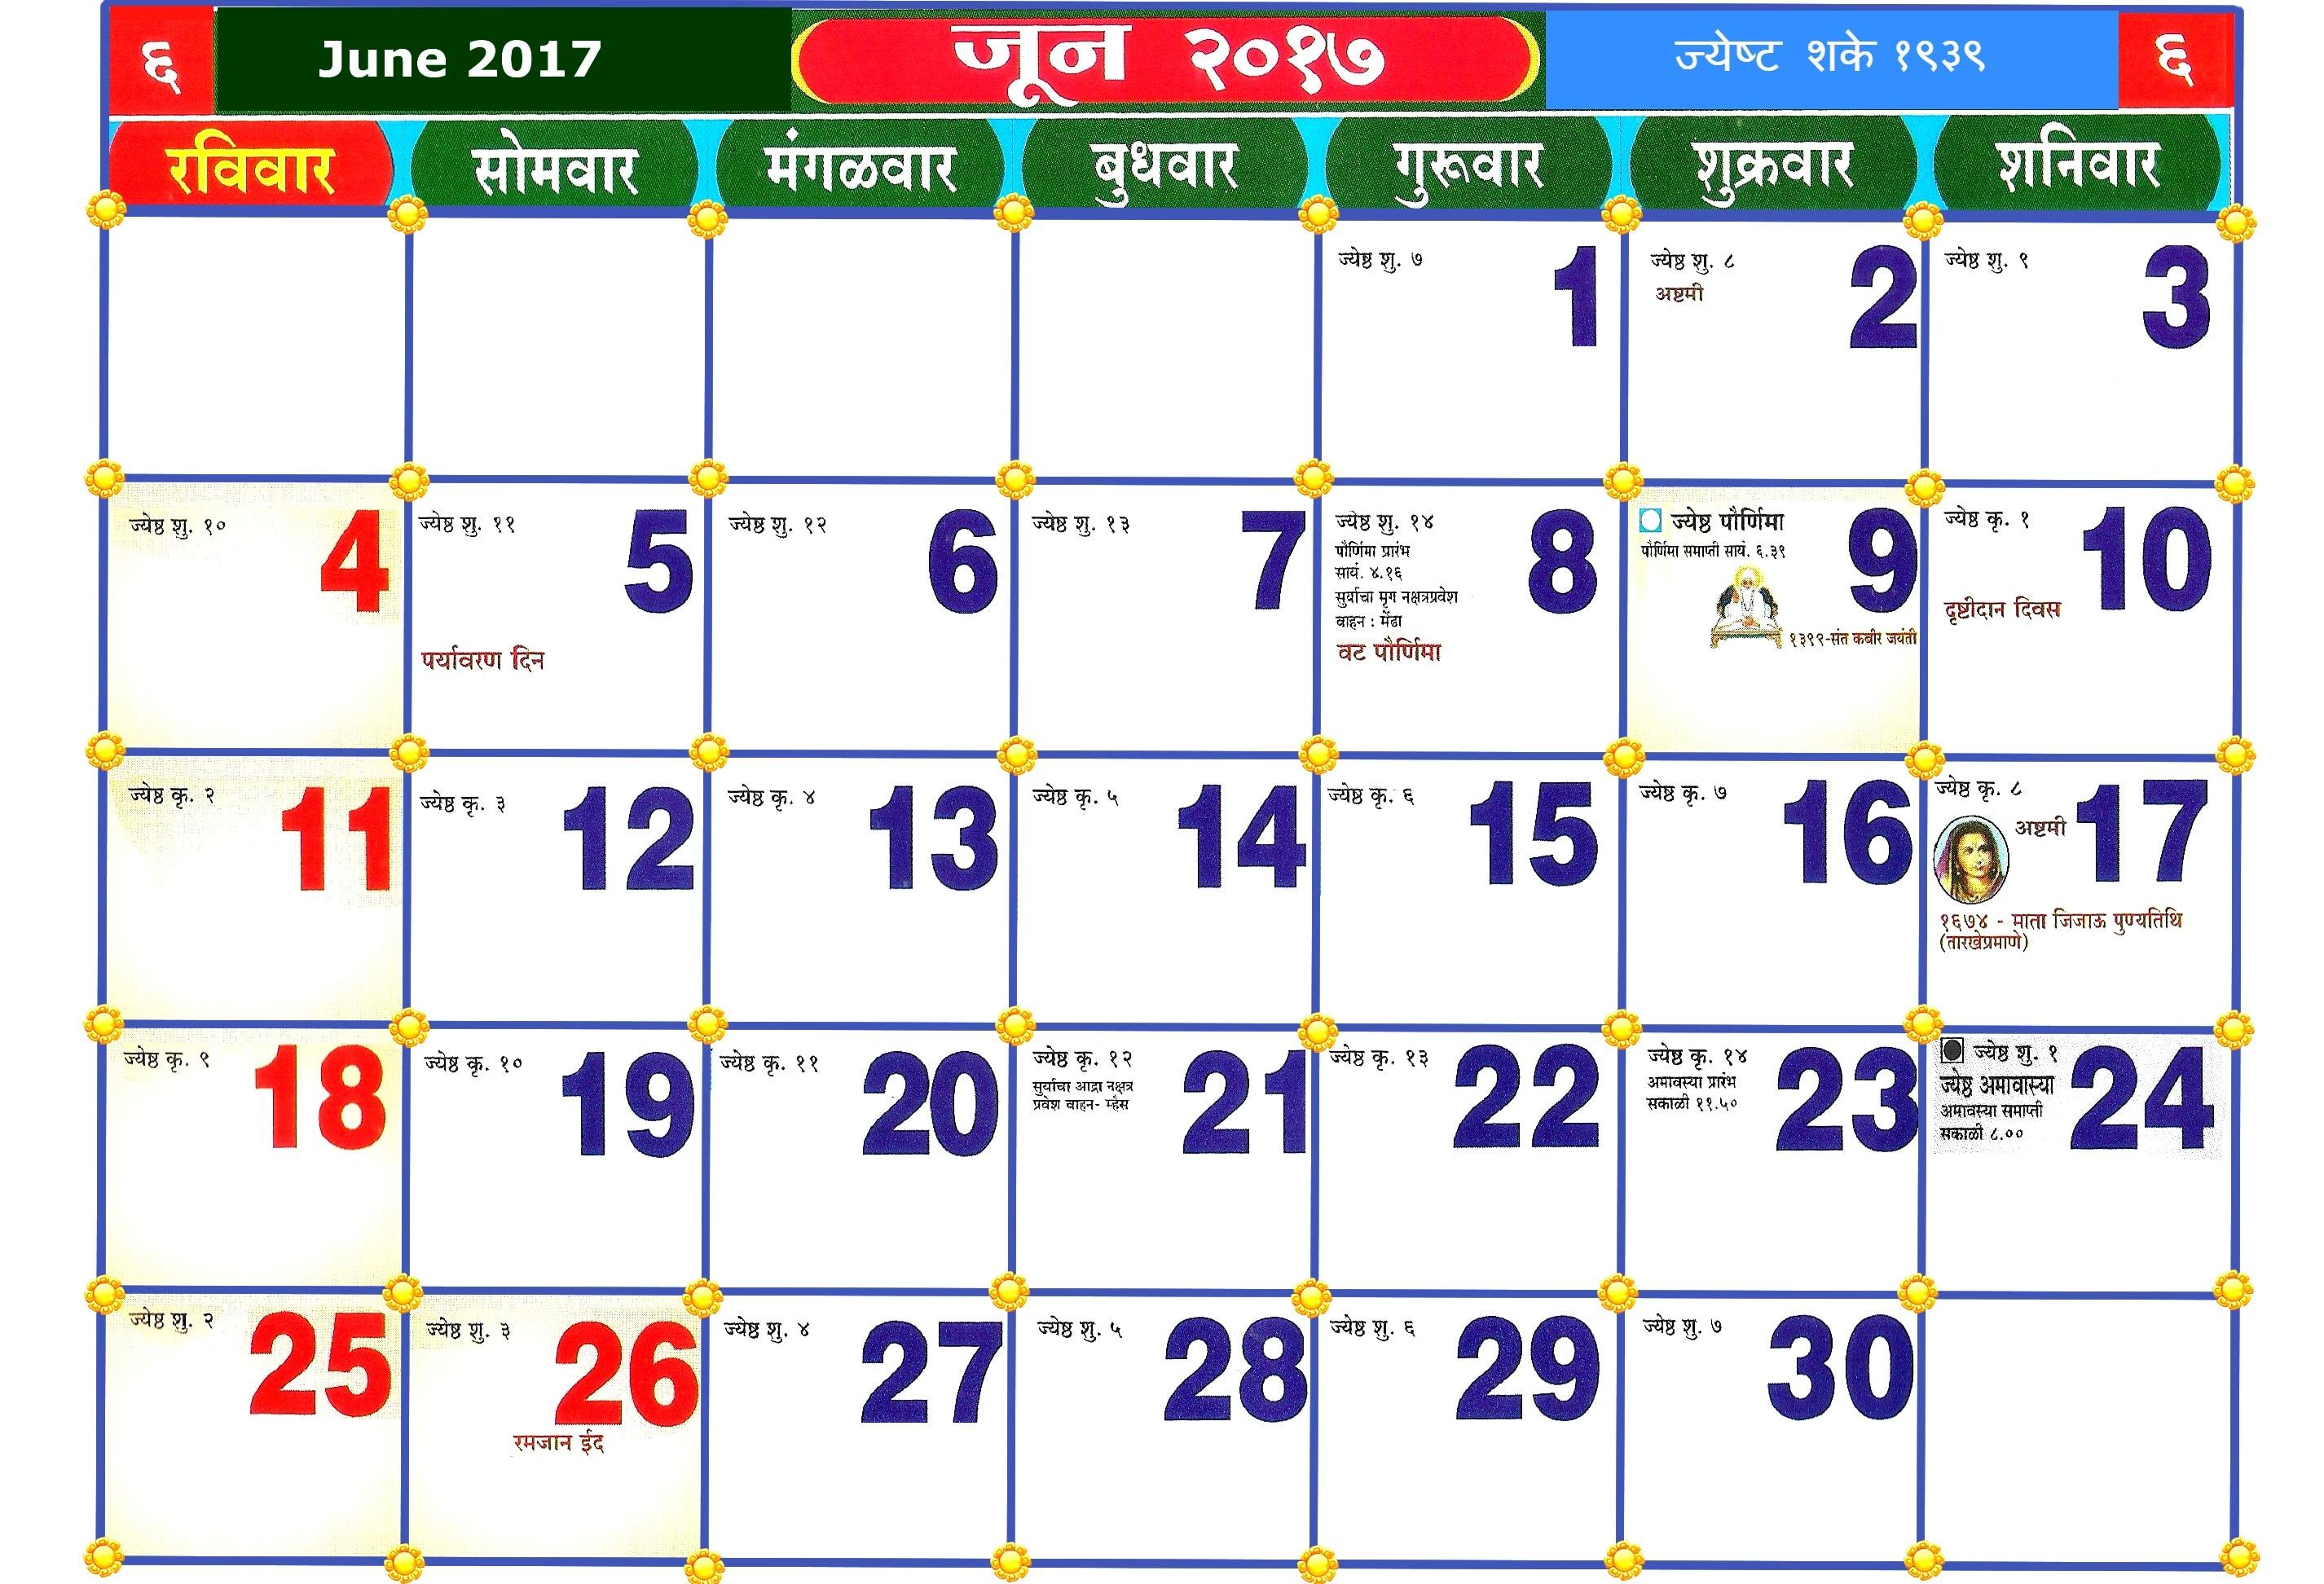 June 2017 Calendar with Indian Festivals